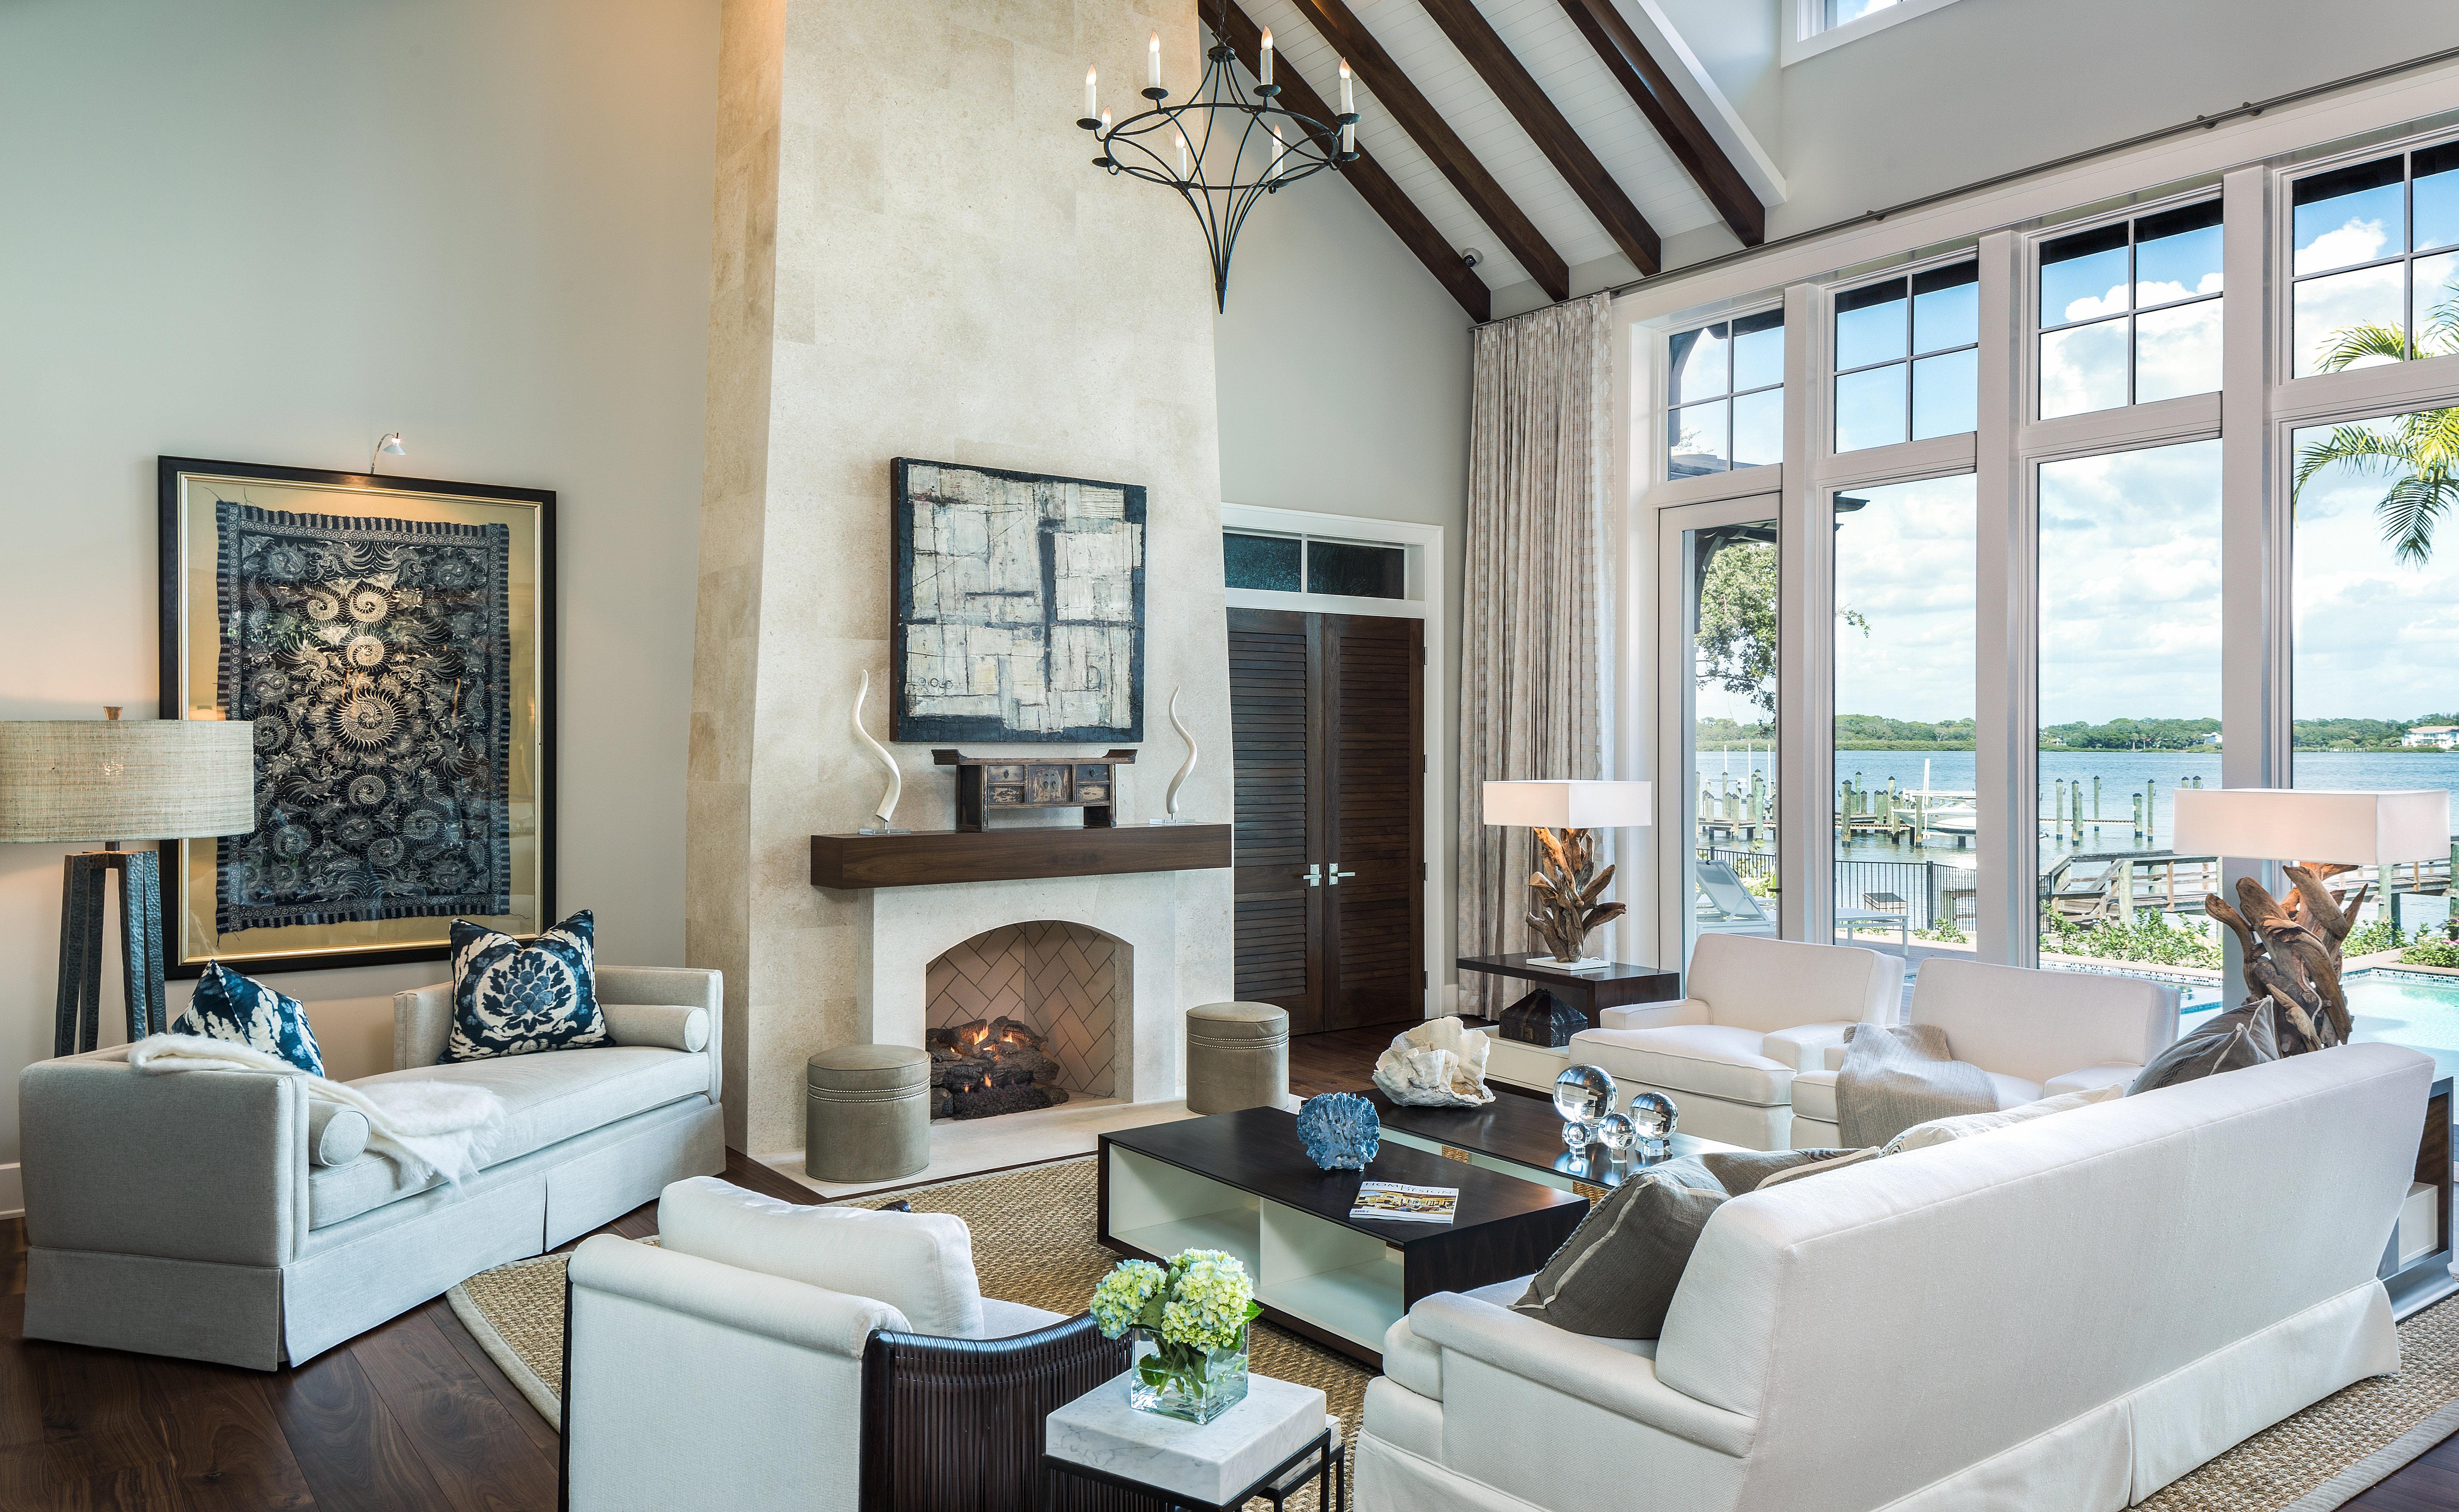 Classic Saltbox House Plans Sarasota Home Design Home Photo Style